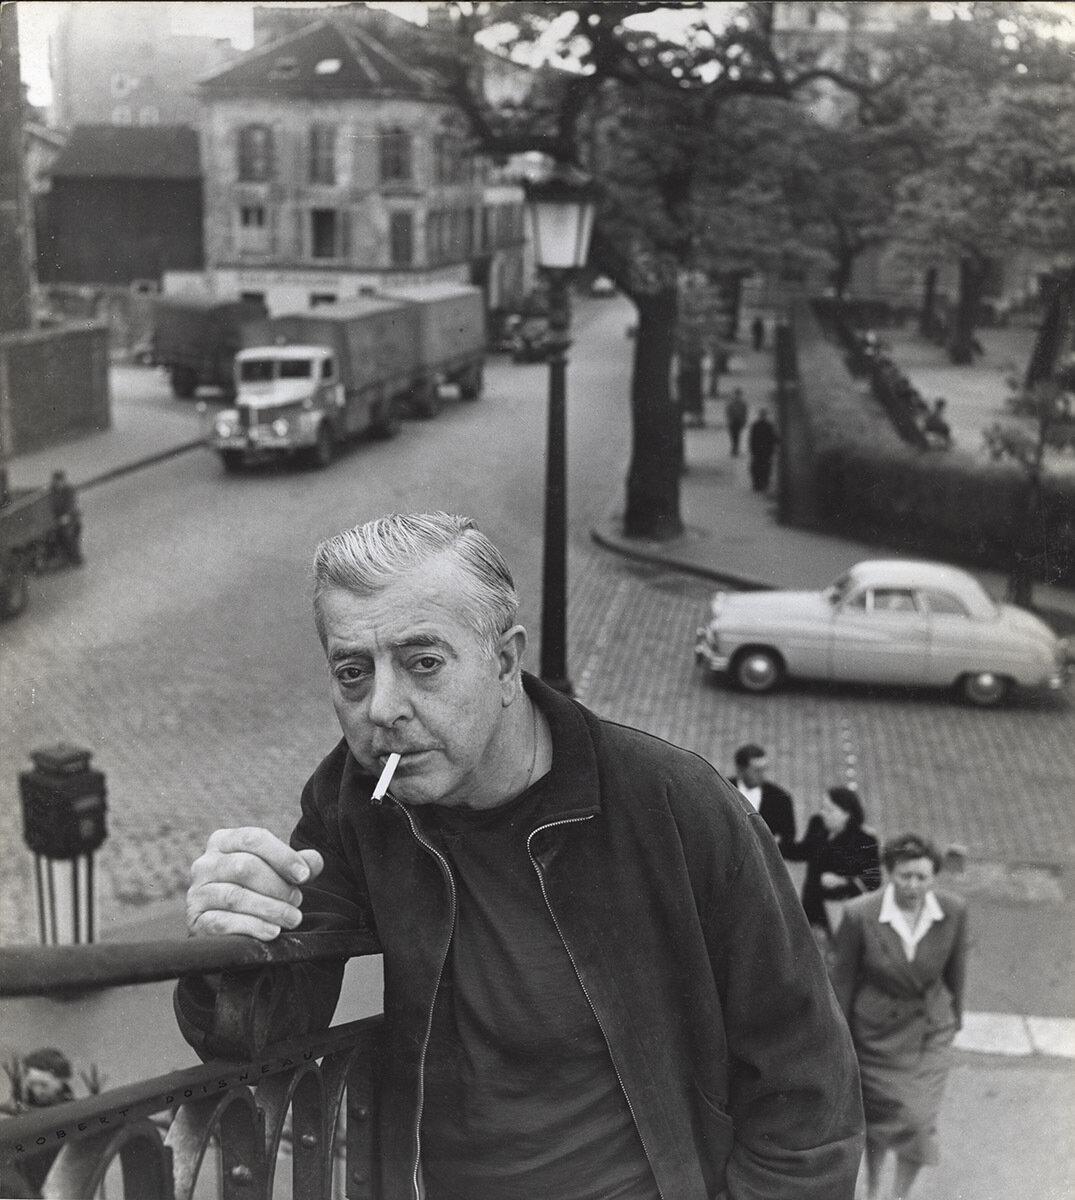 1955. Жак Превер, Мост Альма. Париж